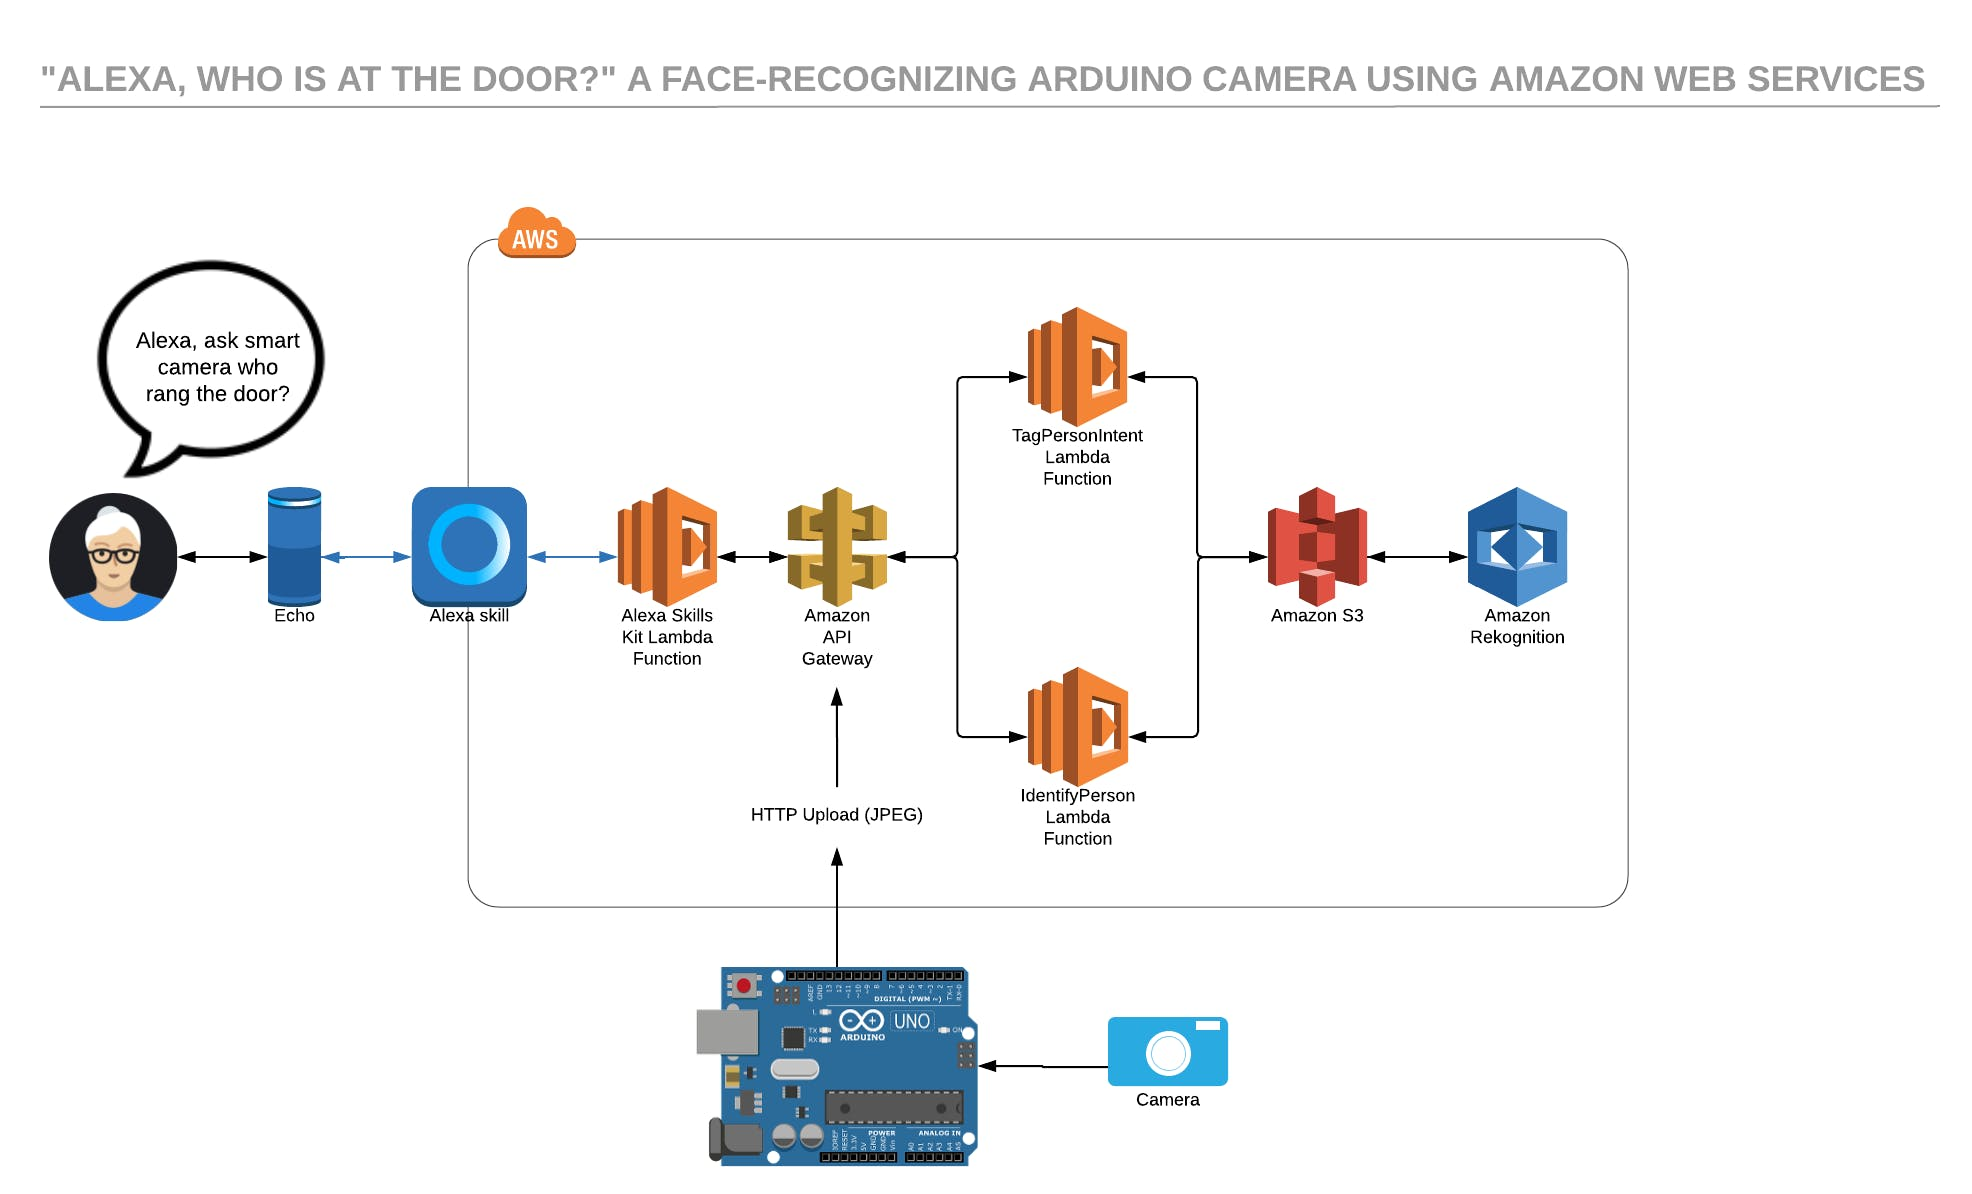 Software / Architecture Diagram